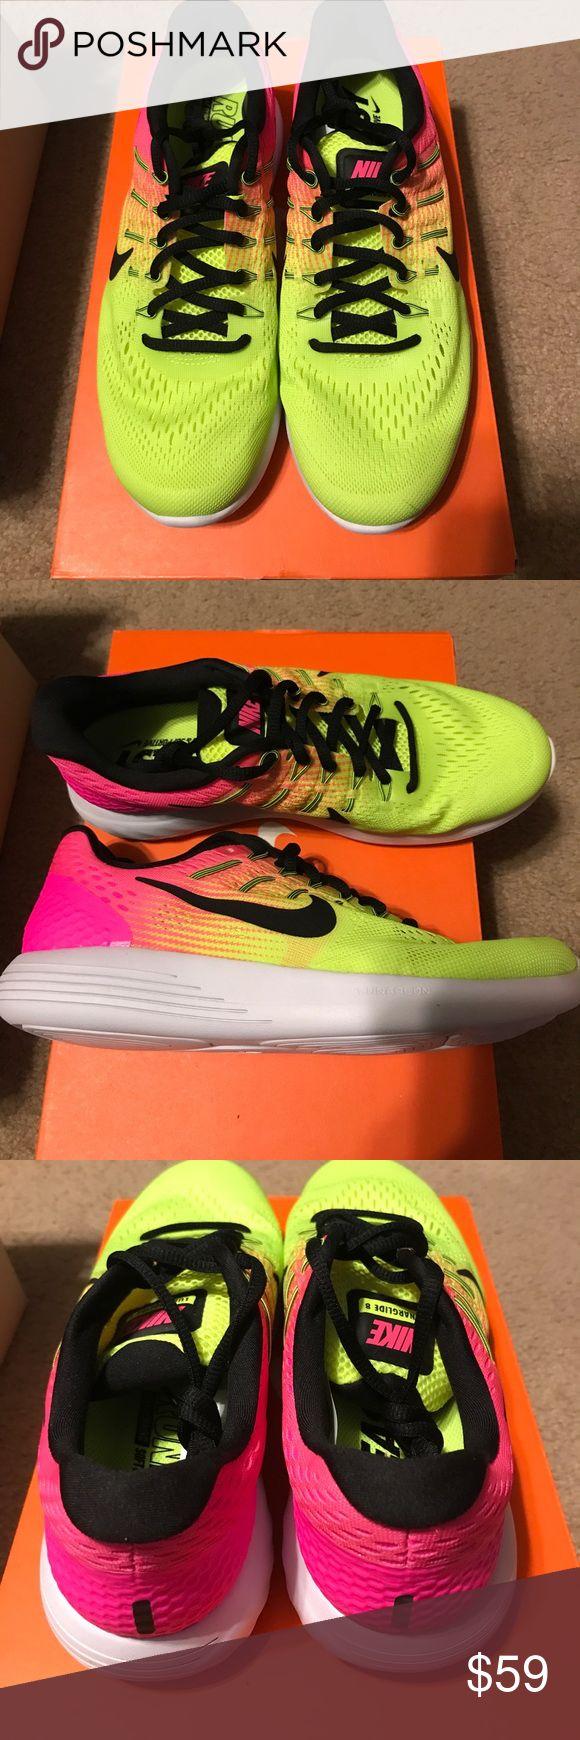 Women's Nike Lunarglide Brand New women's Nike Lunarglide 8 OC Nike Shoes Athletic Shoes